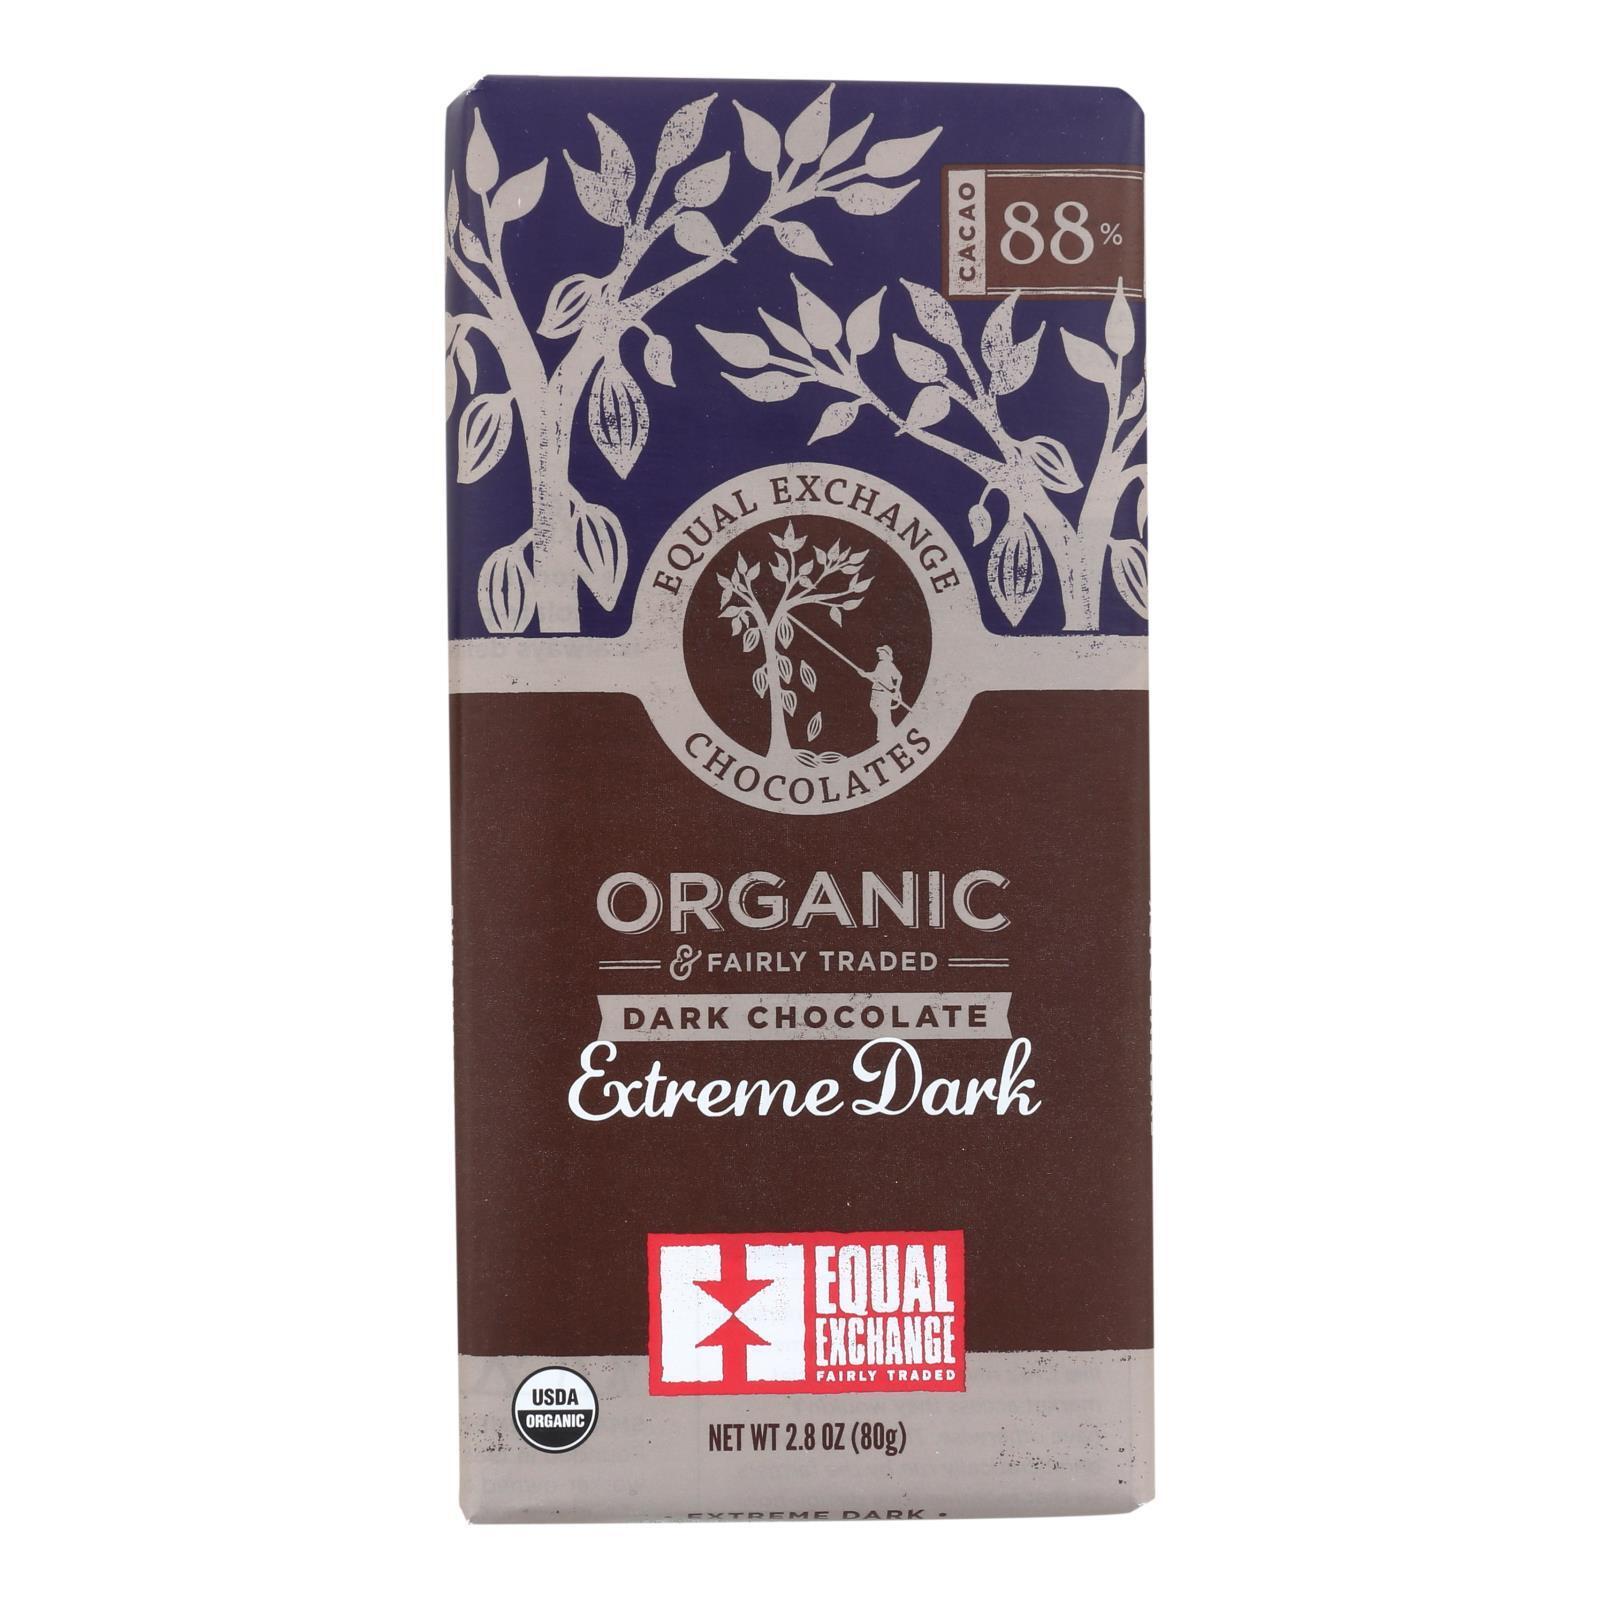 Equal Exchange Organic Chocolate Bar - Extreme Dark - Case of 12 - 2.8 oz.